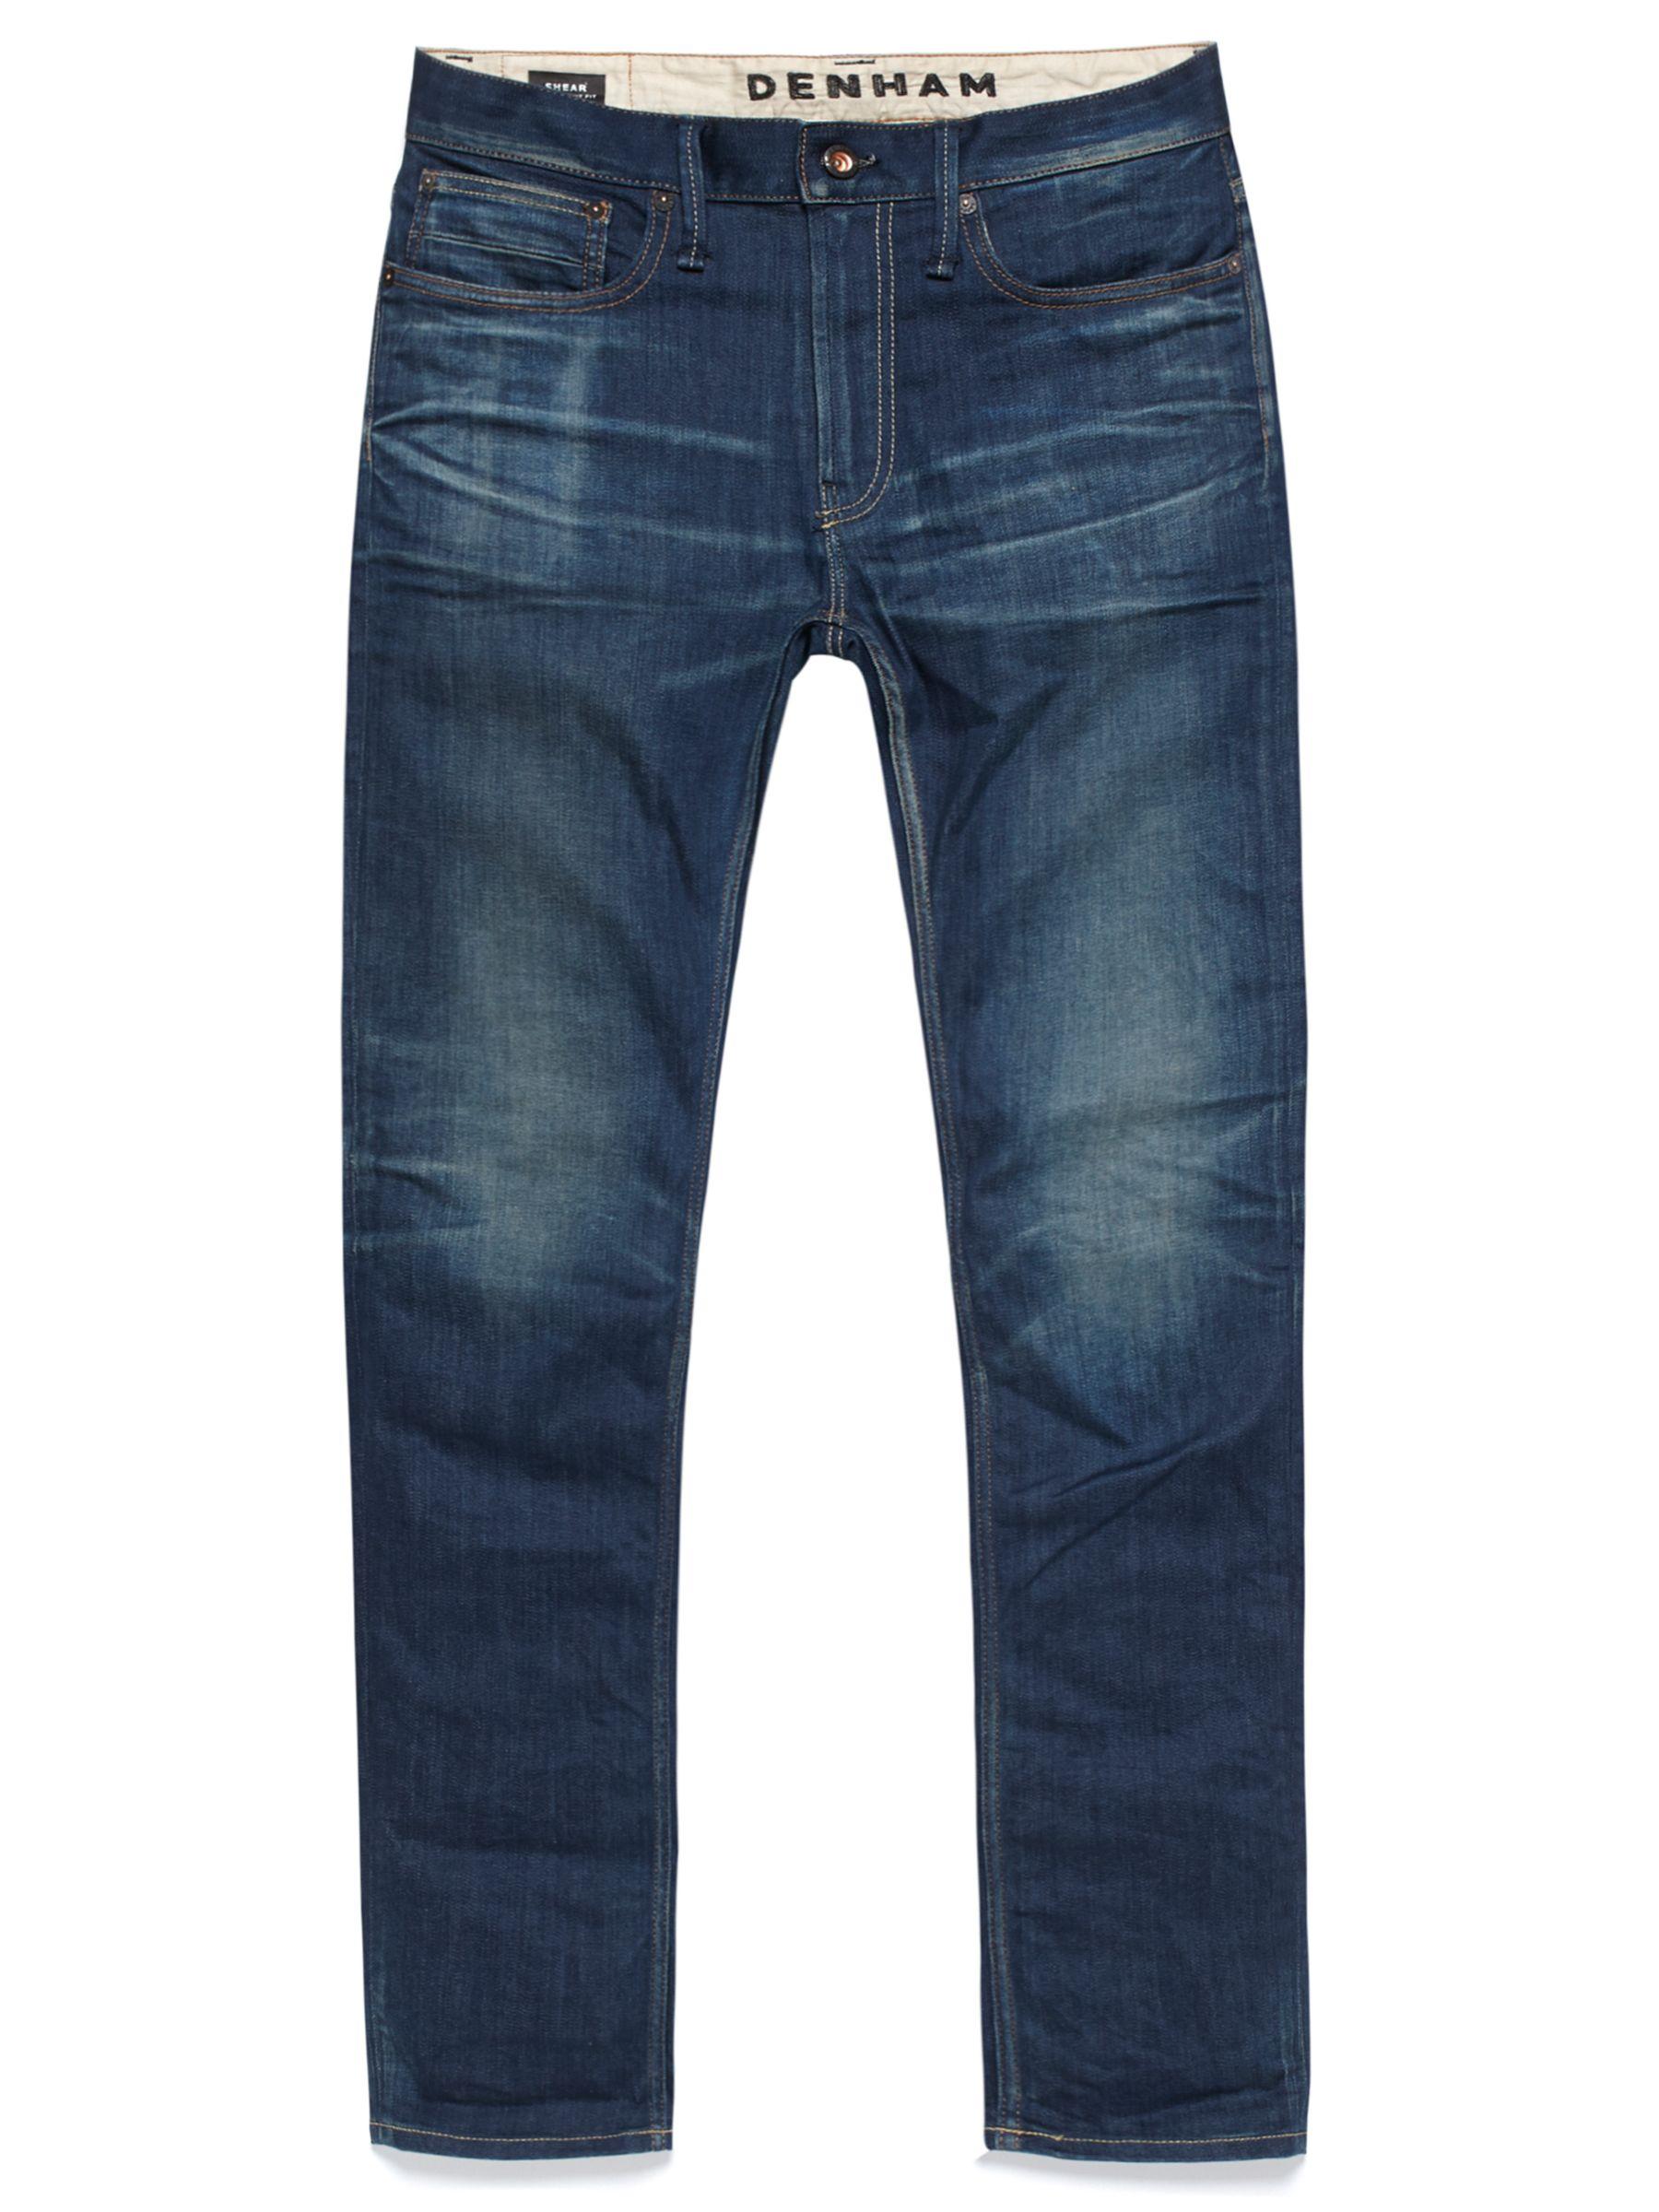 Denham Denham Razor Slim Fit Jeans, Blue Fade